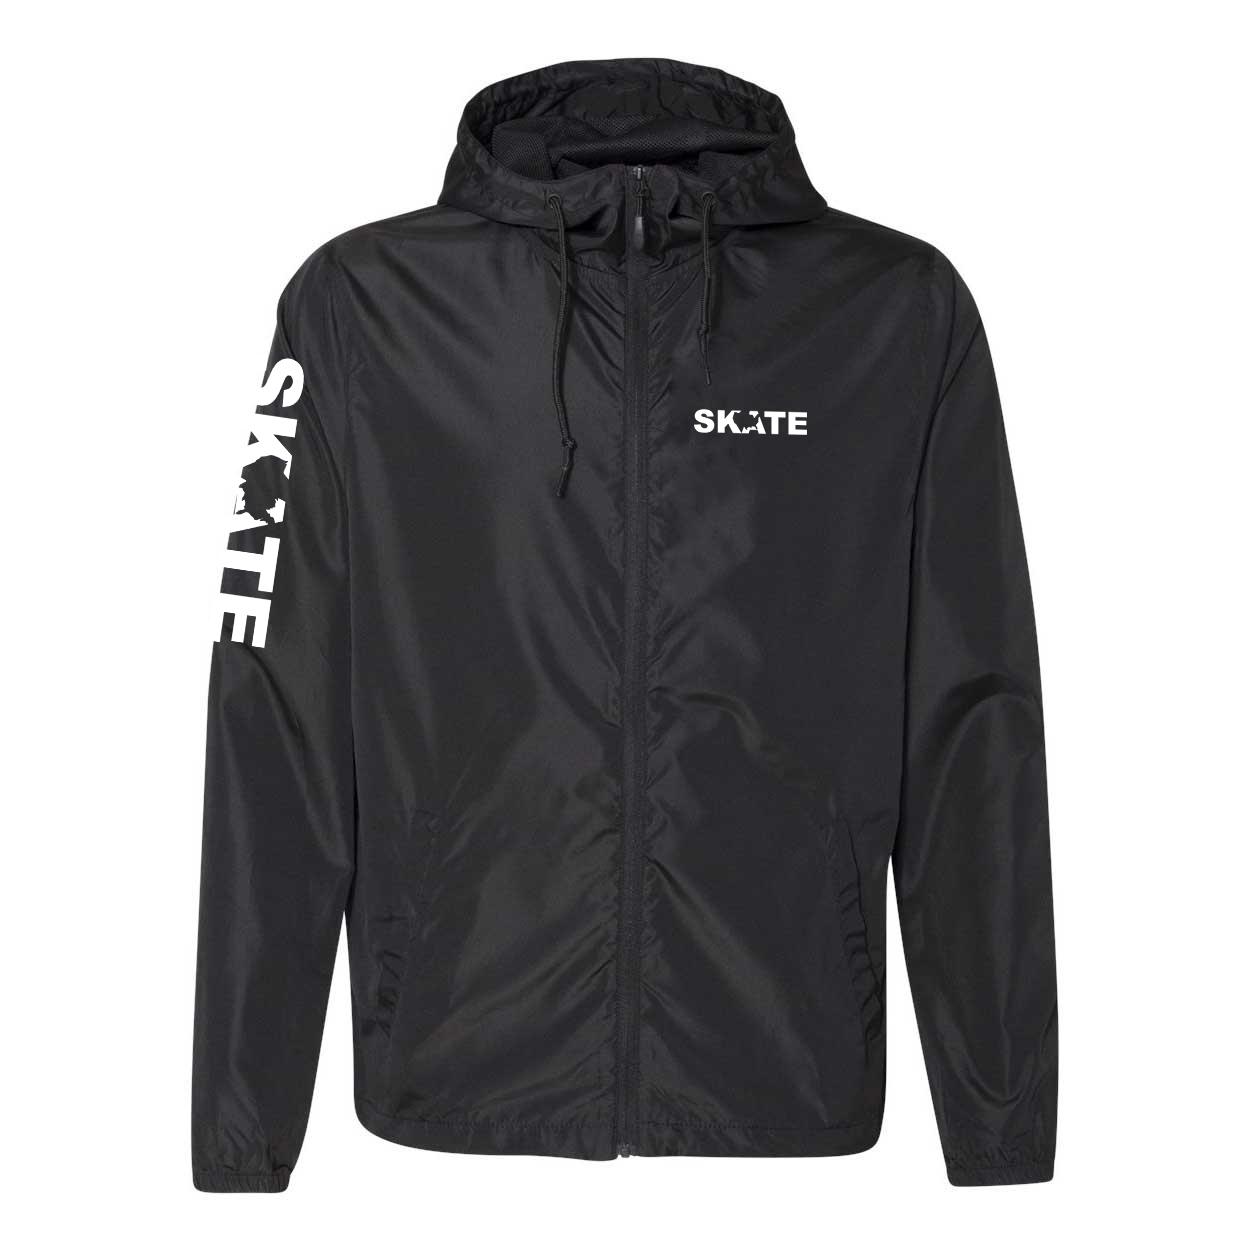 Skate United States Classic Lightweight Windbreaker Black (White Logo)